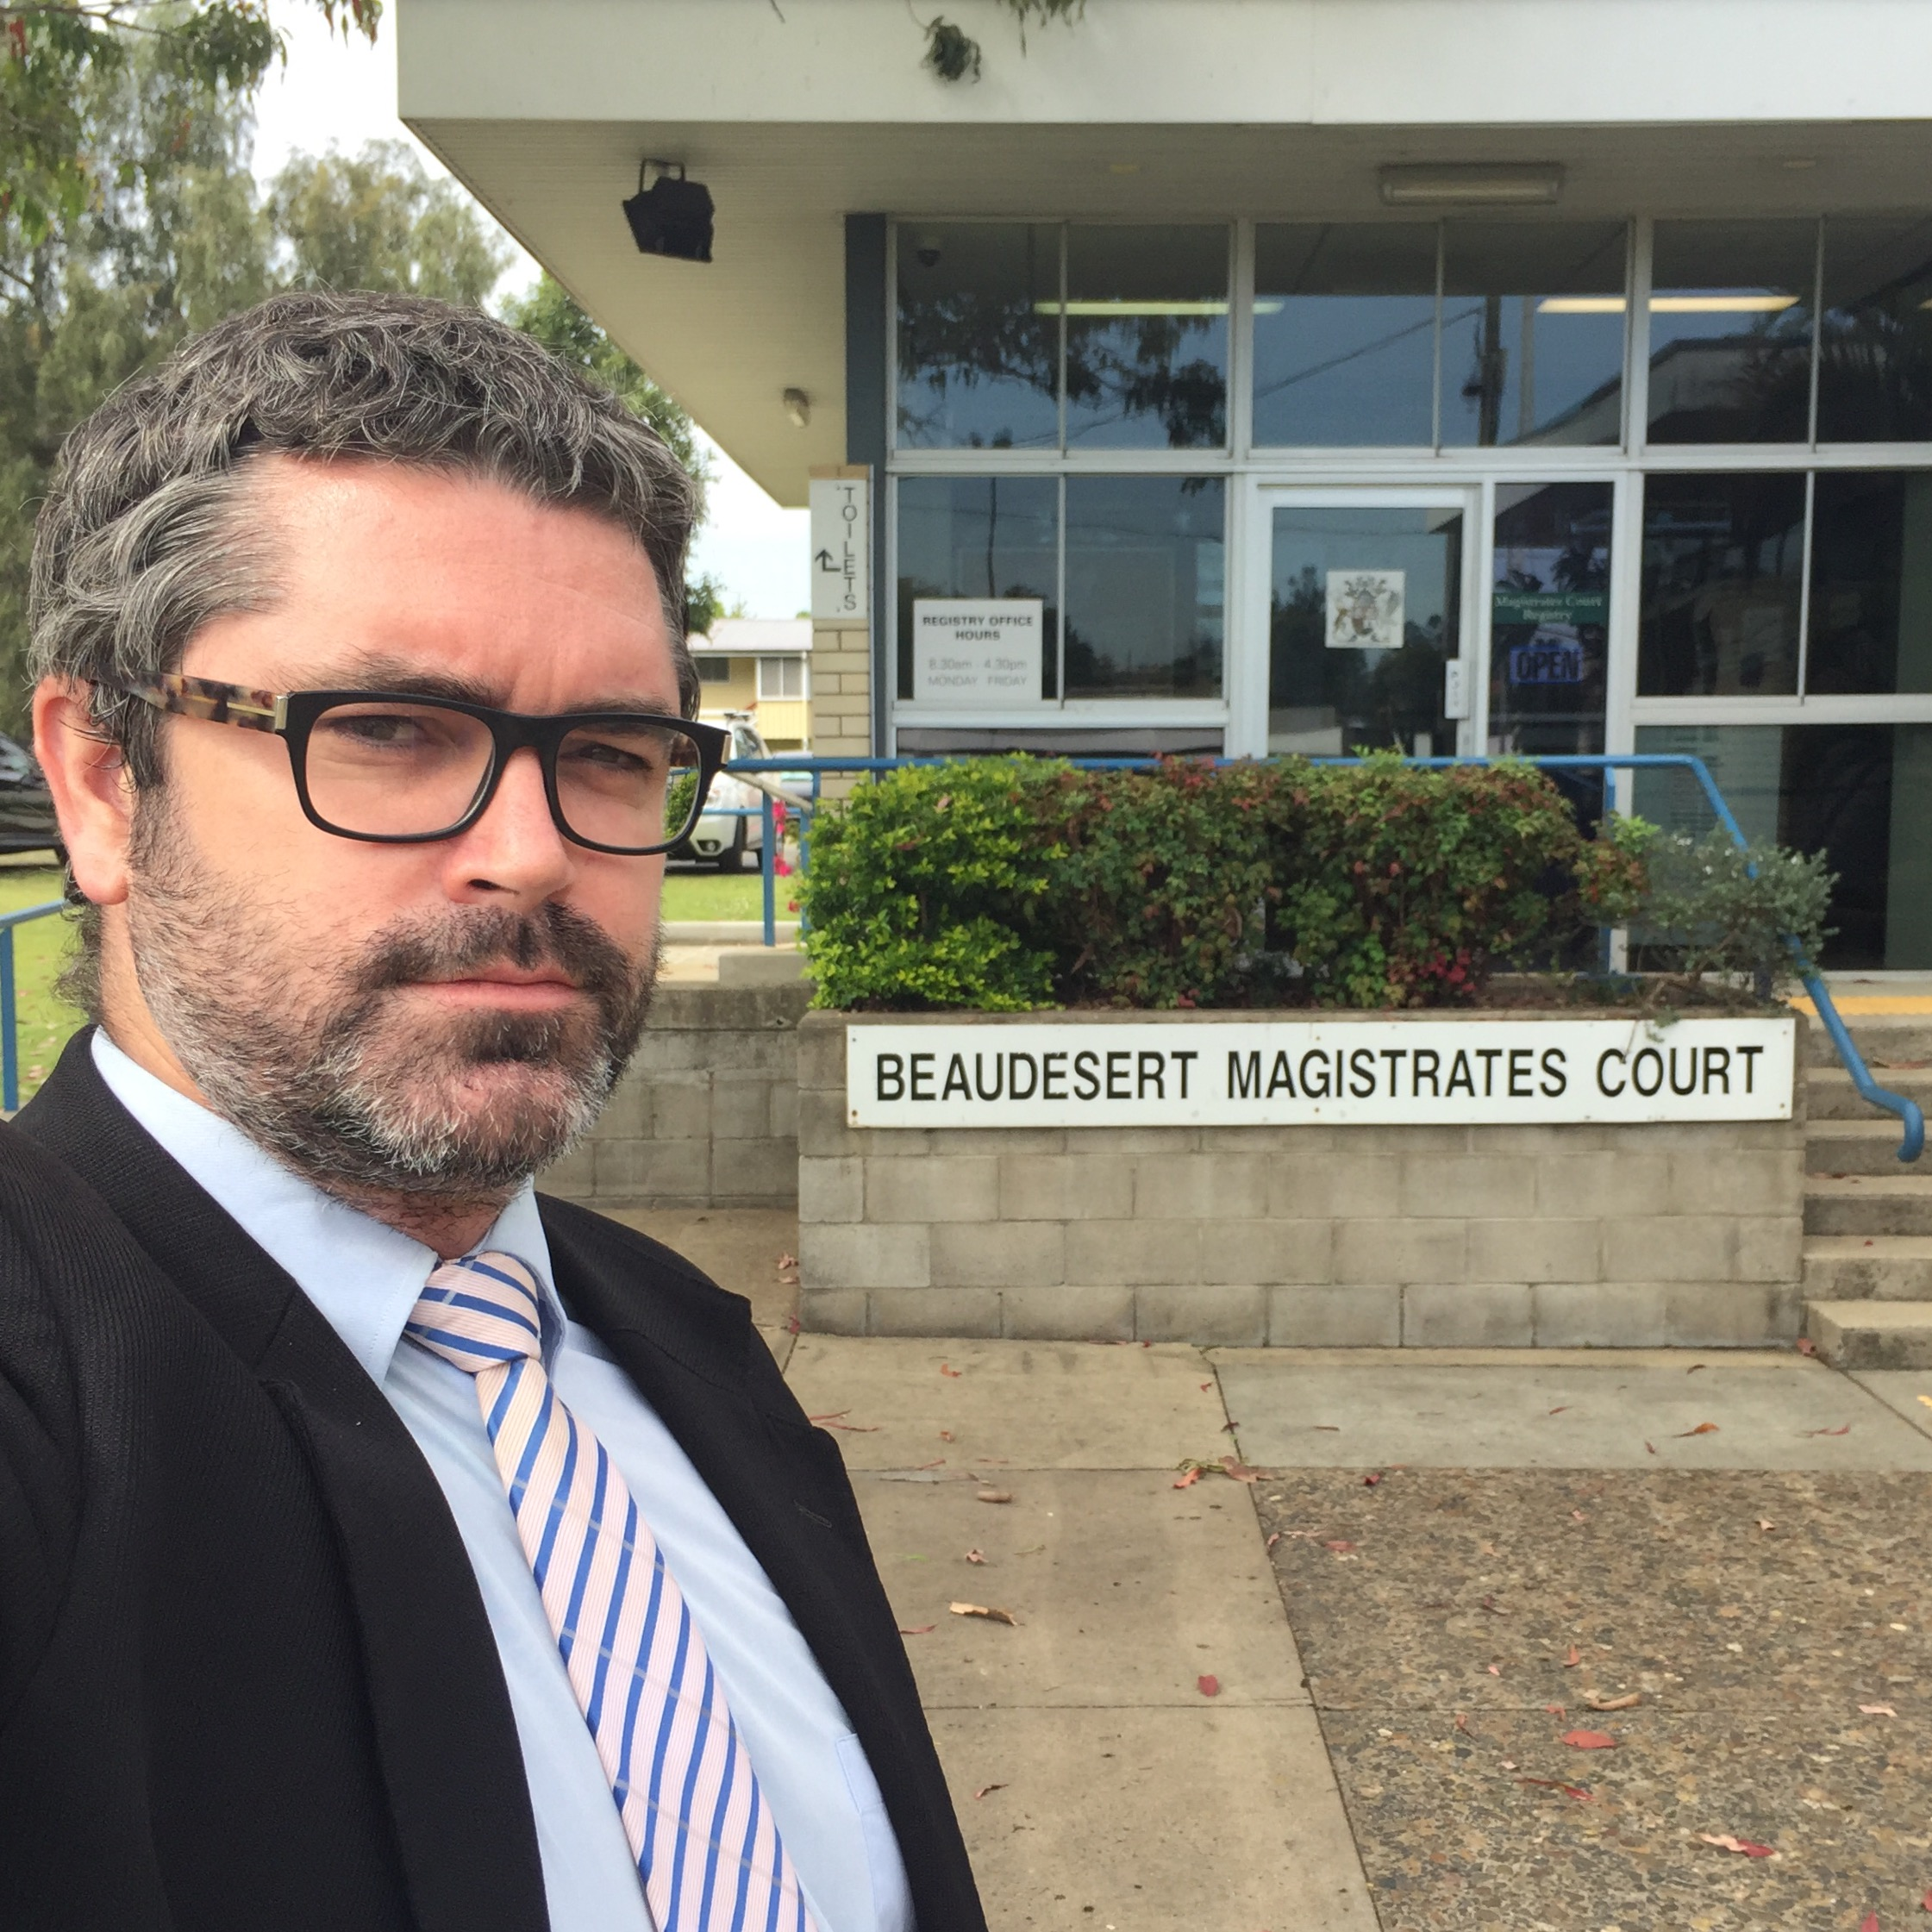 Beaudesert DUI Drink Driving Drug Driving Lawyer